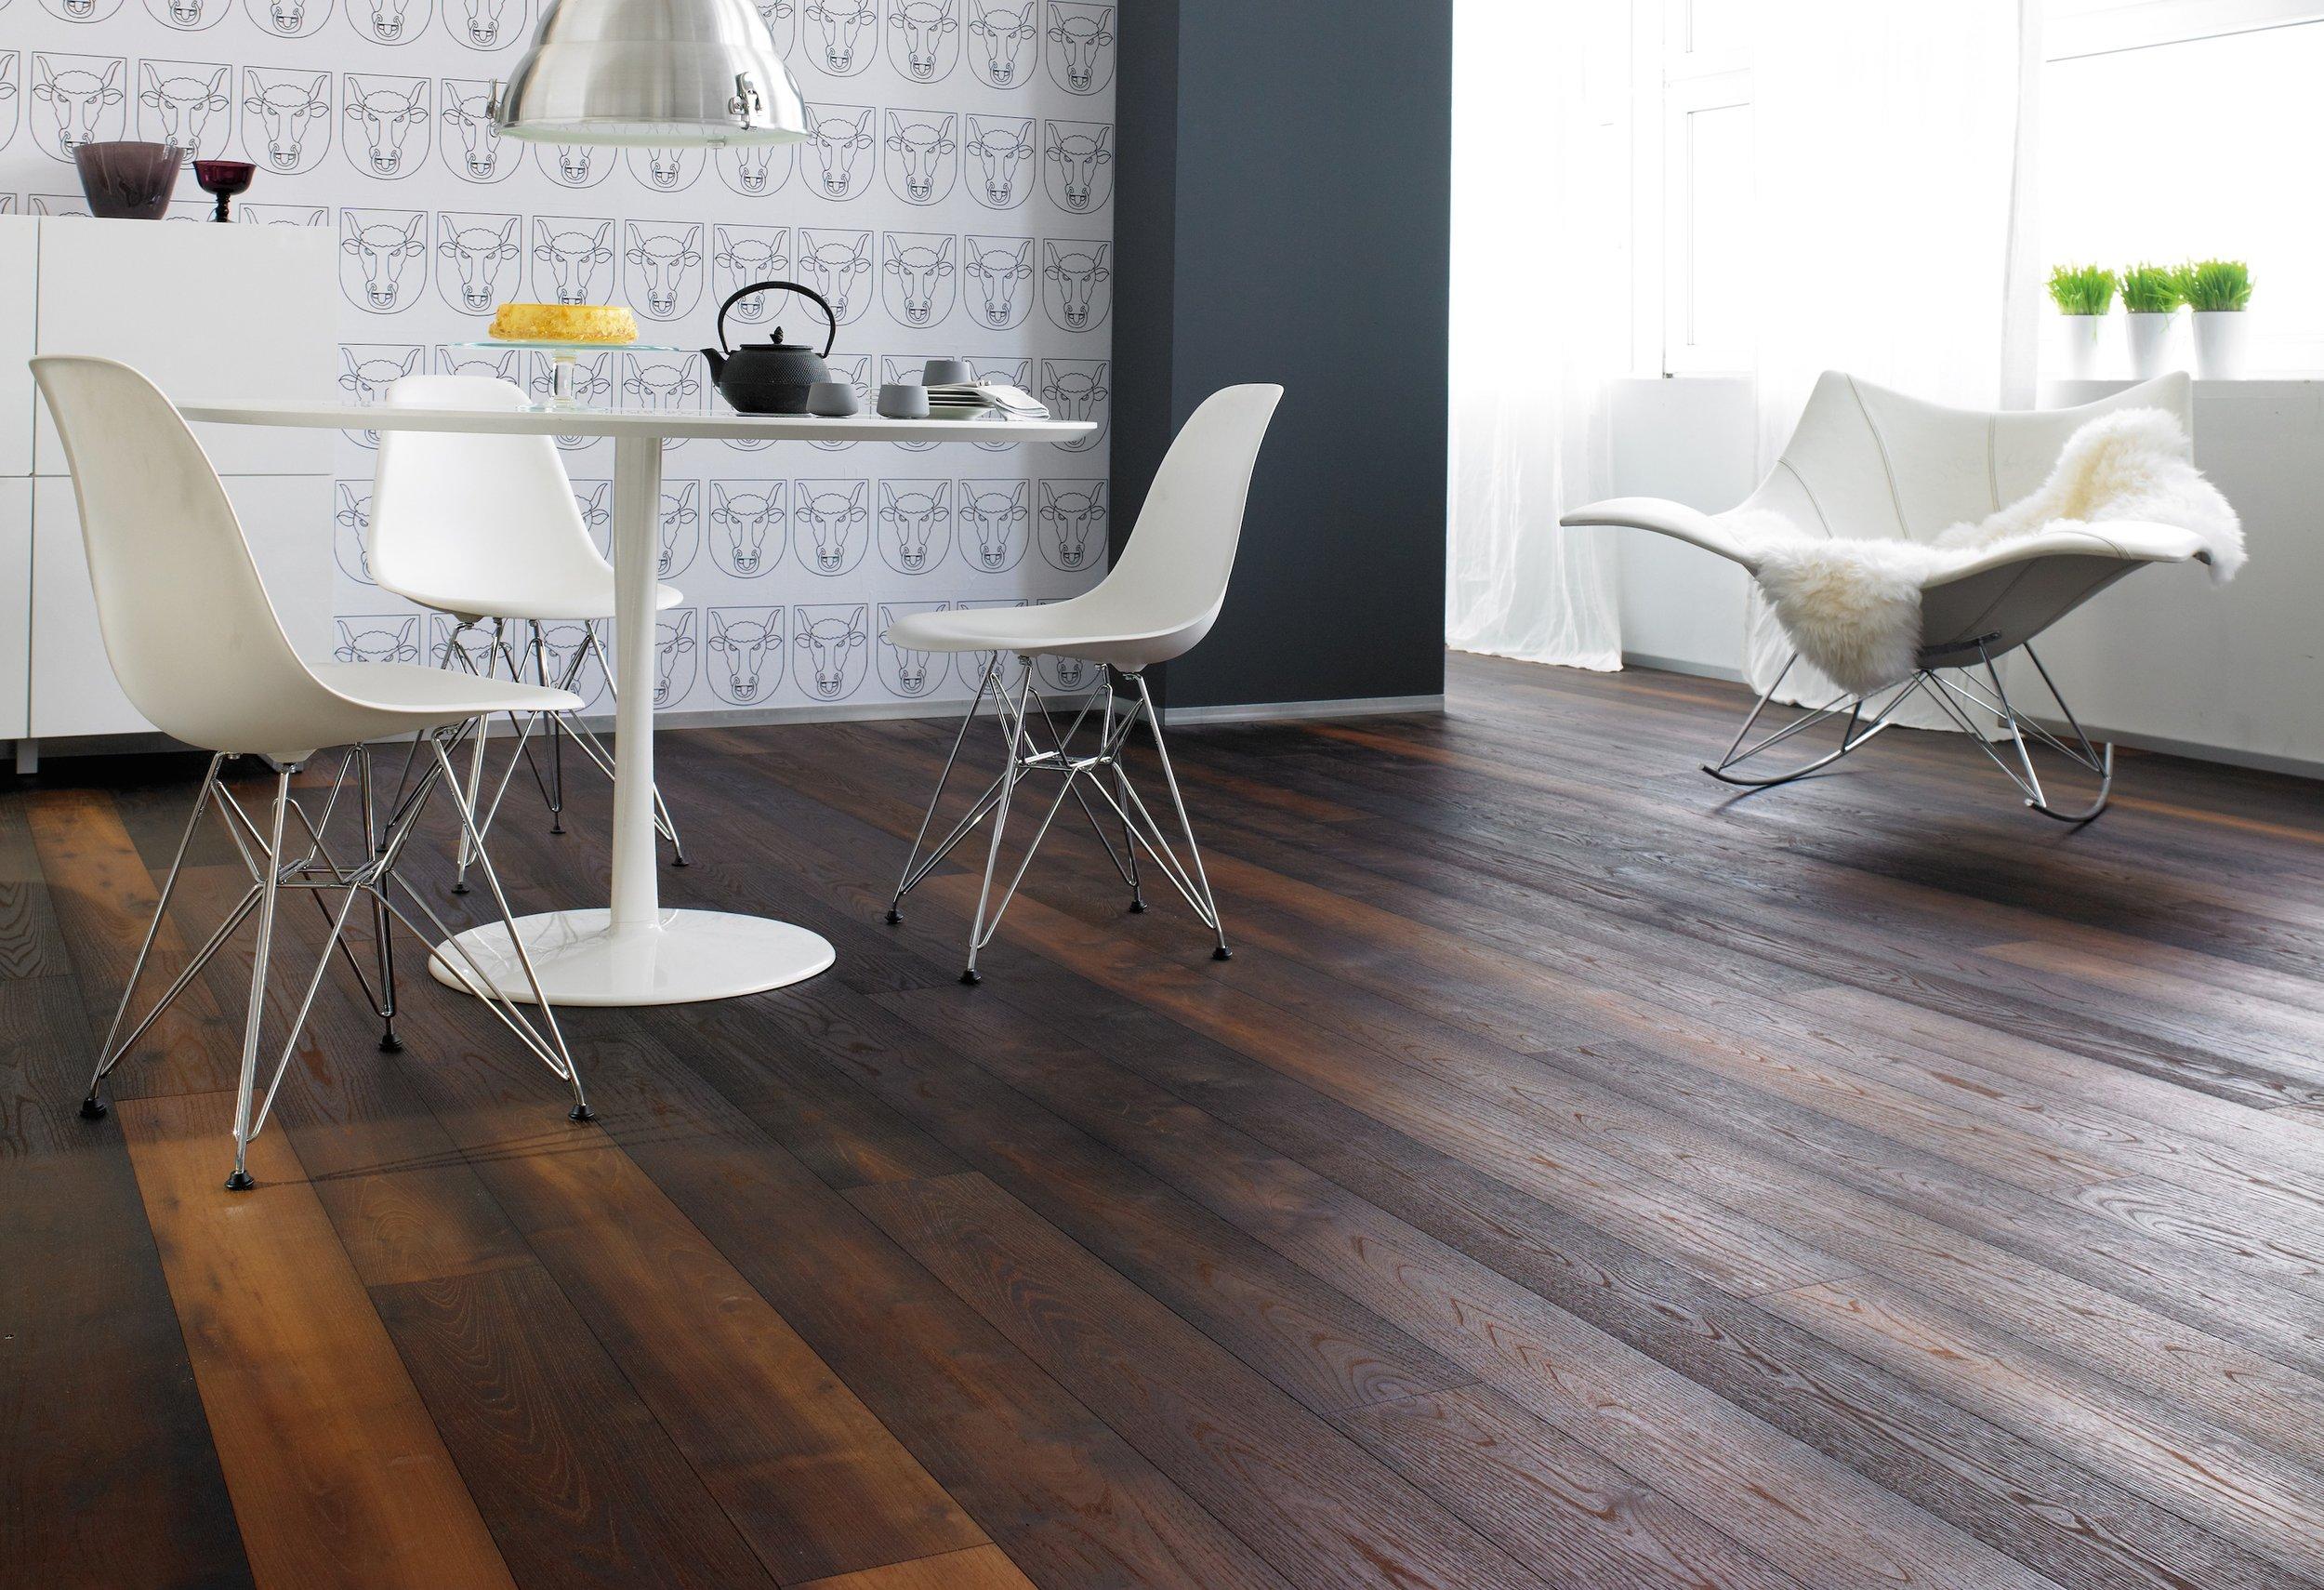 bauwerk parquet collezione 2017 legno pavimento termosanitaria bra piemonte